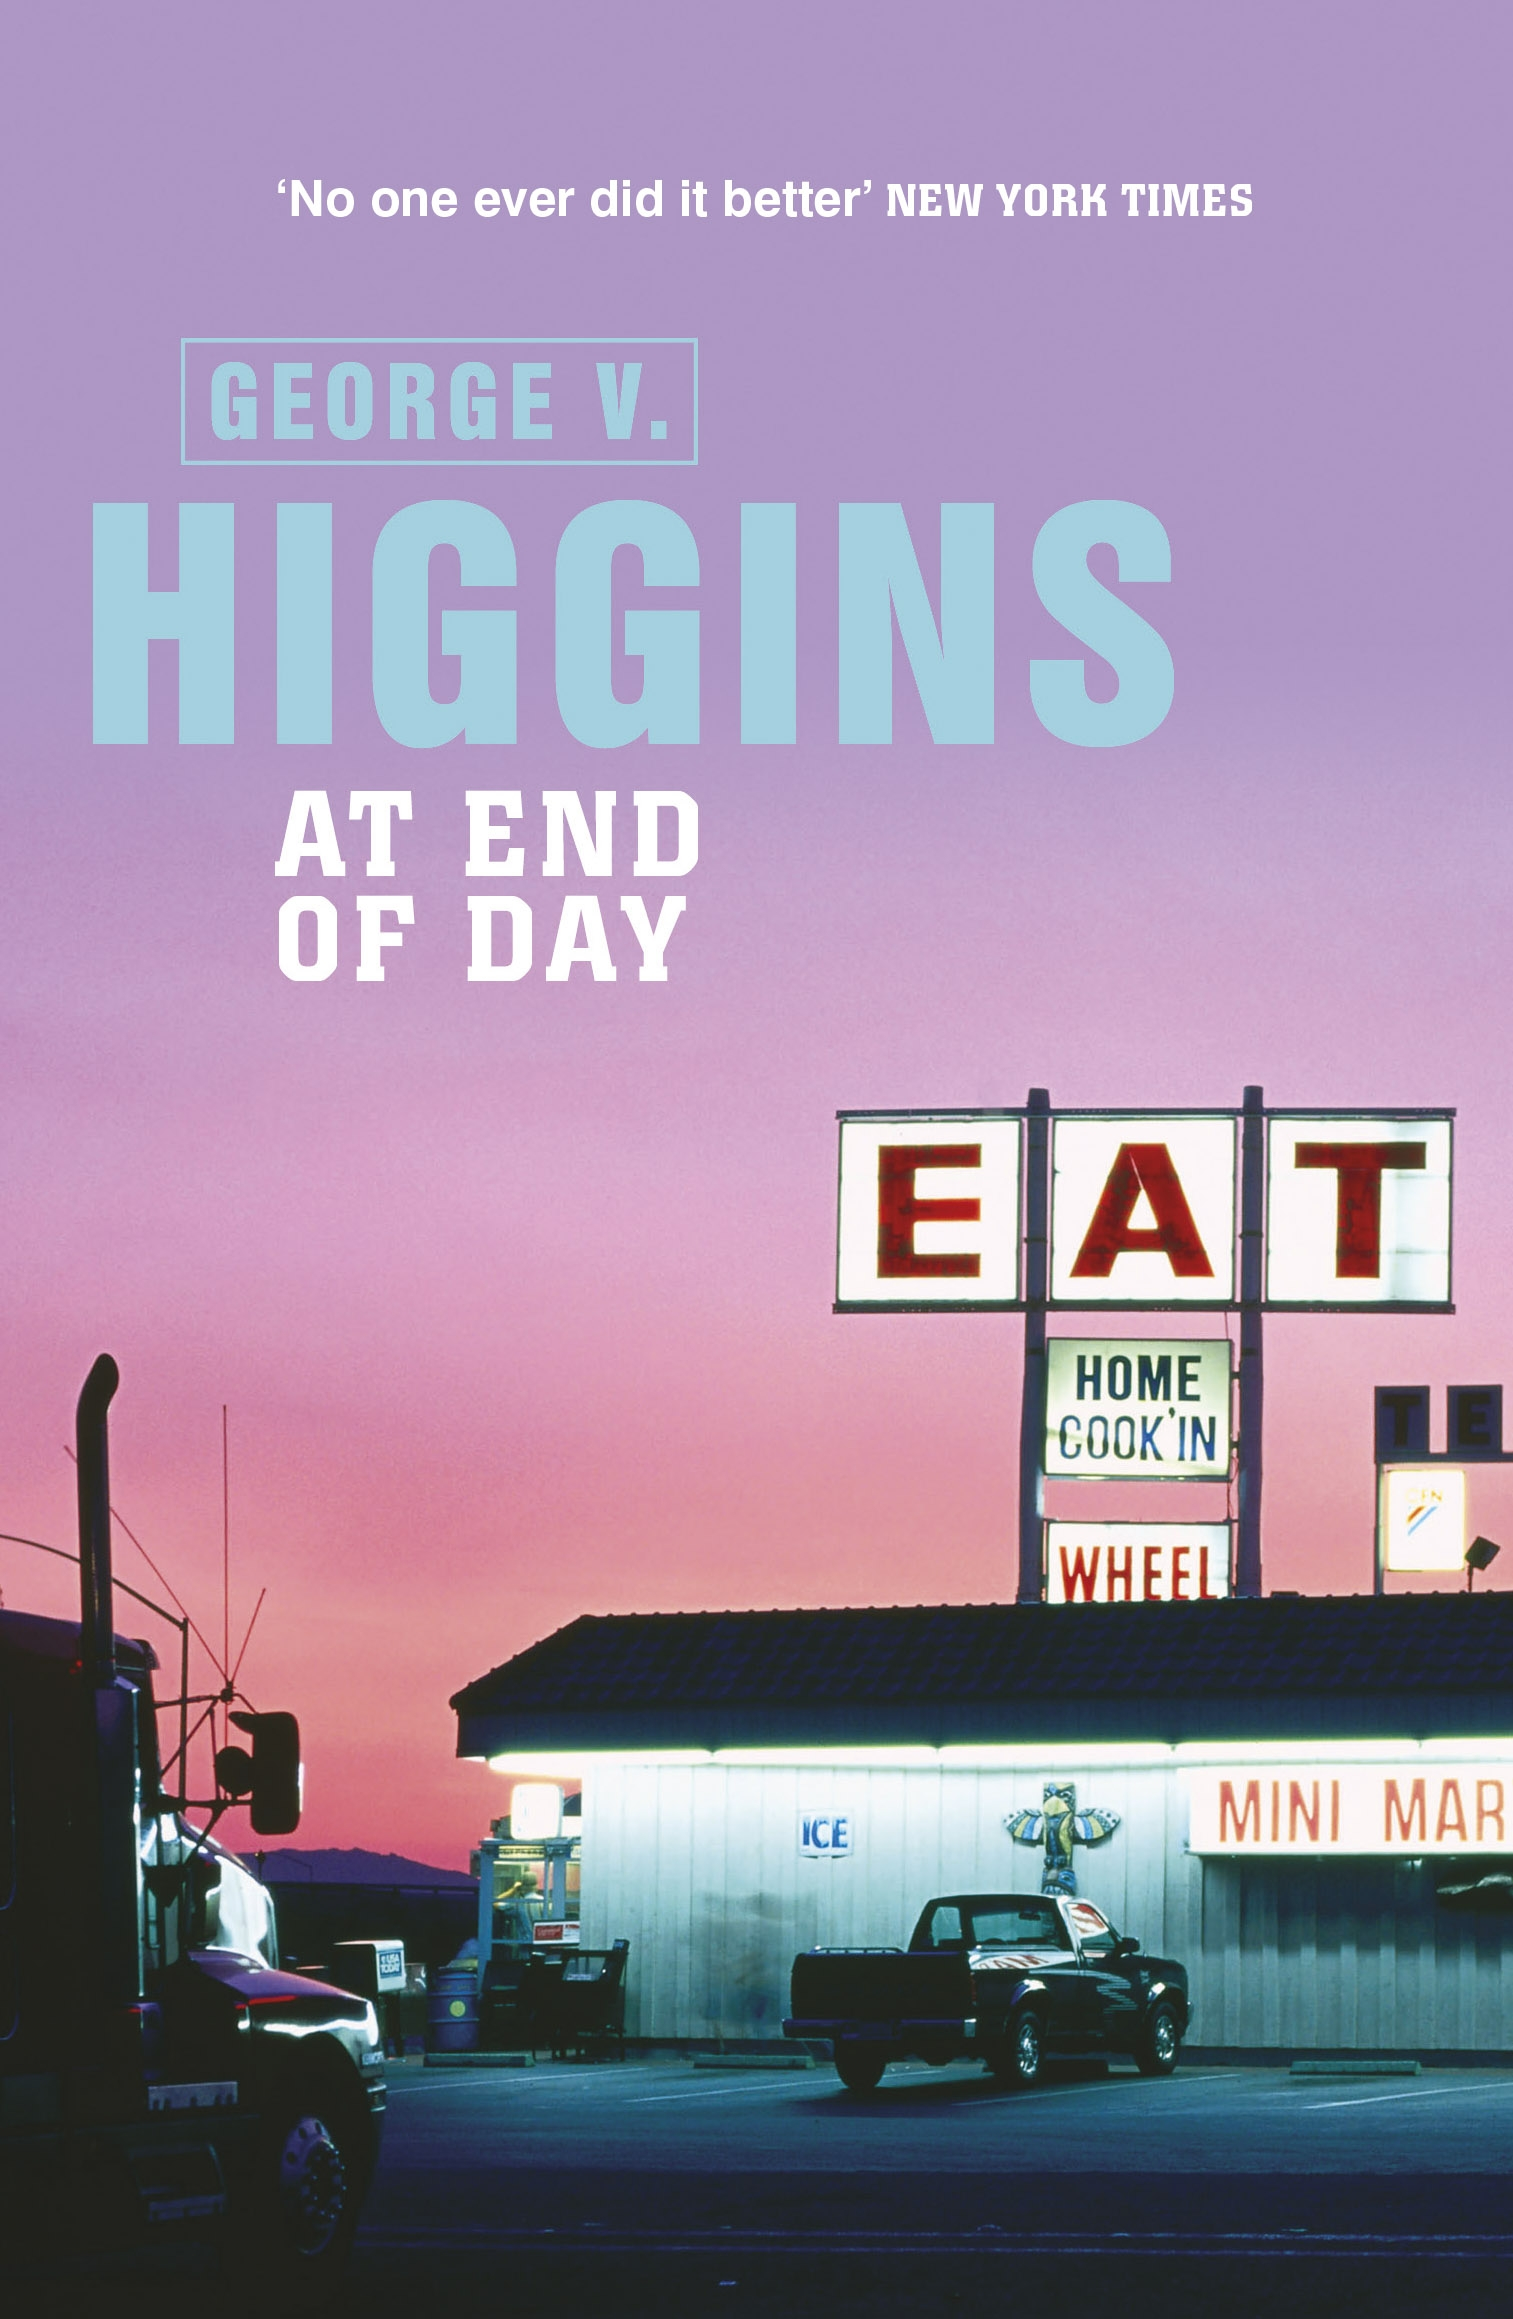 At End of Day by George V. Higgins | Orion - Bringing You News ...